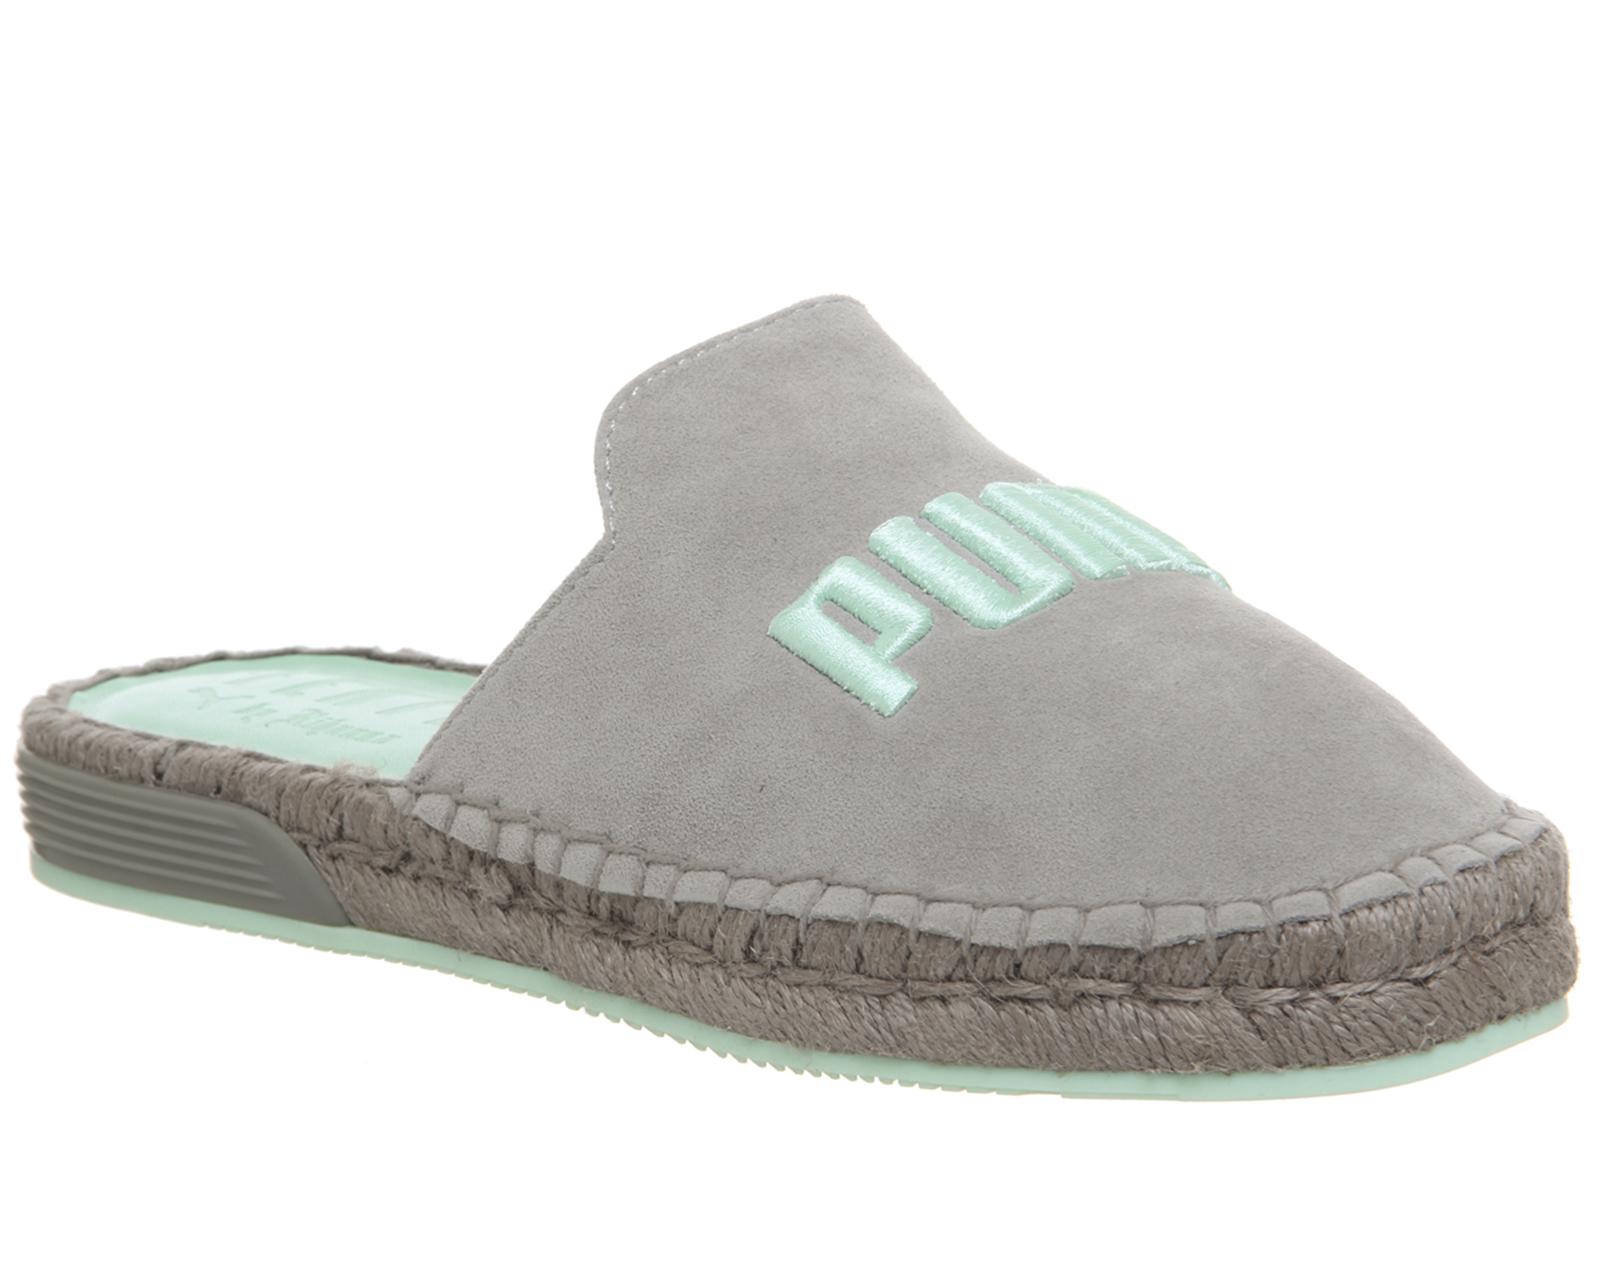 Sentinel Womens Puma Grey Suede Slip on Sandals Size UK 6  Ex-Display c78caab1cc